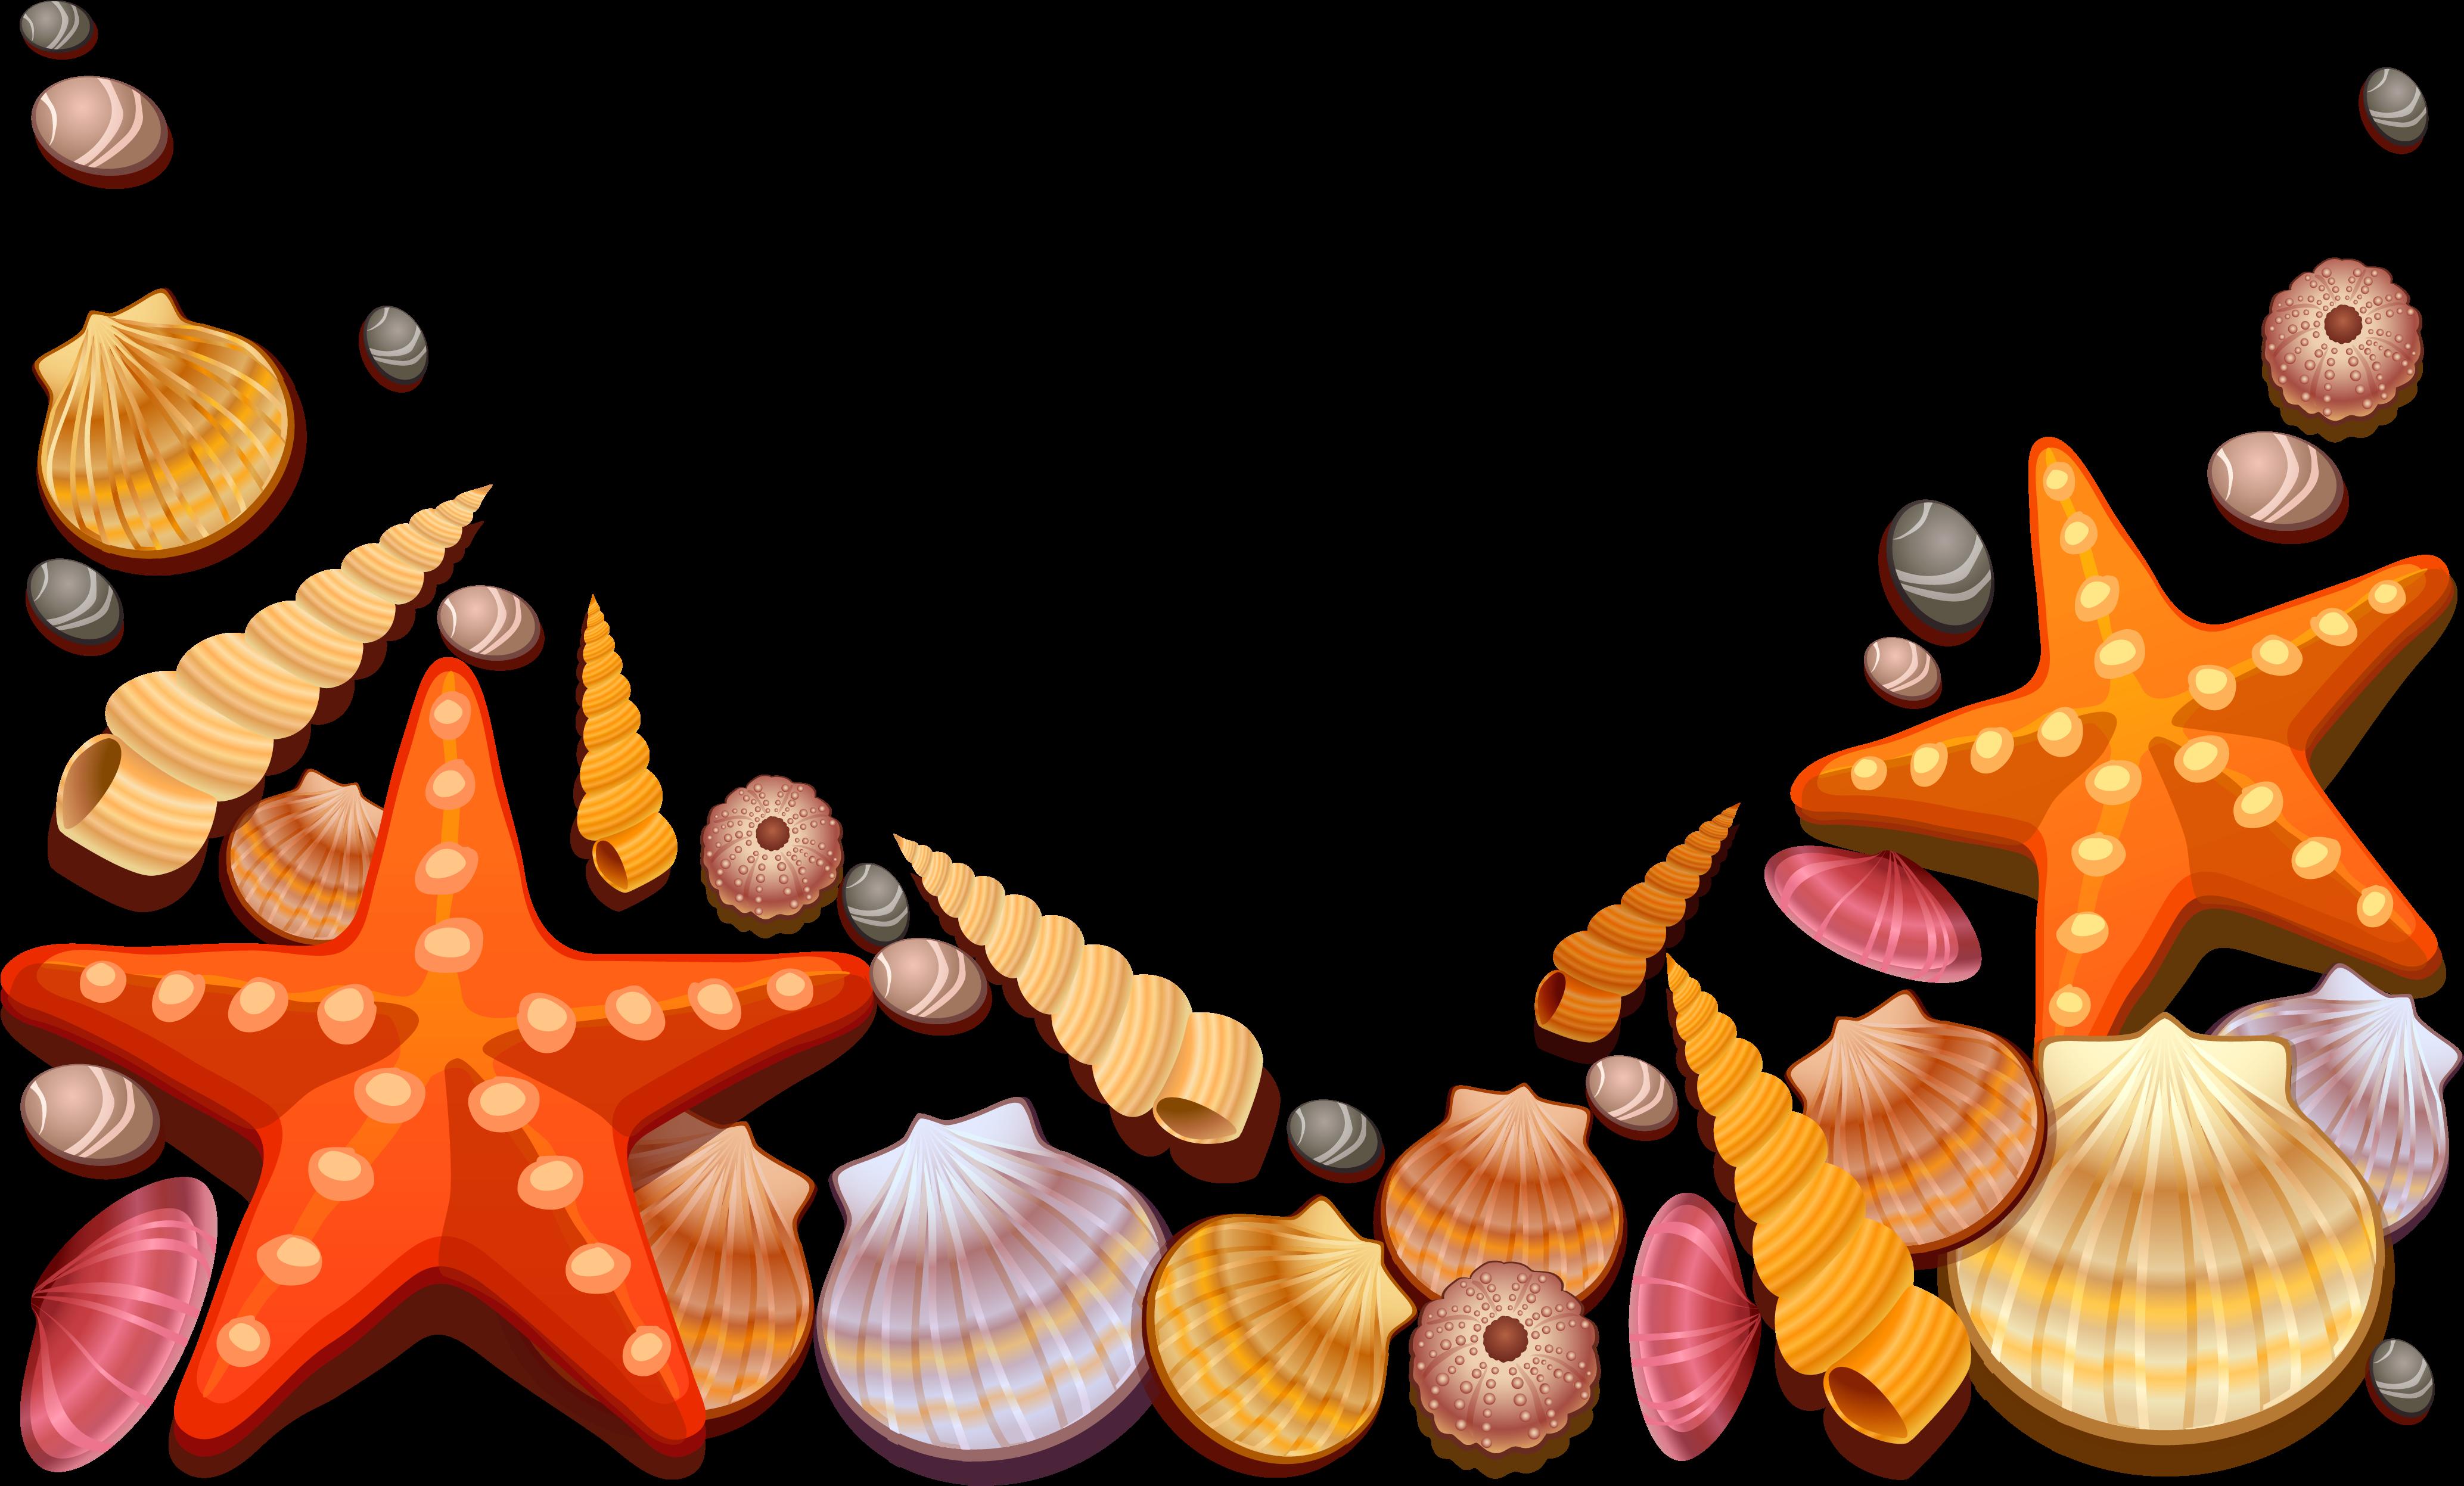 Portable Network Graphics Clip art Vector graphics Seashell.